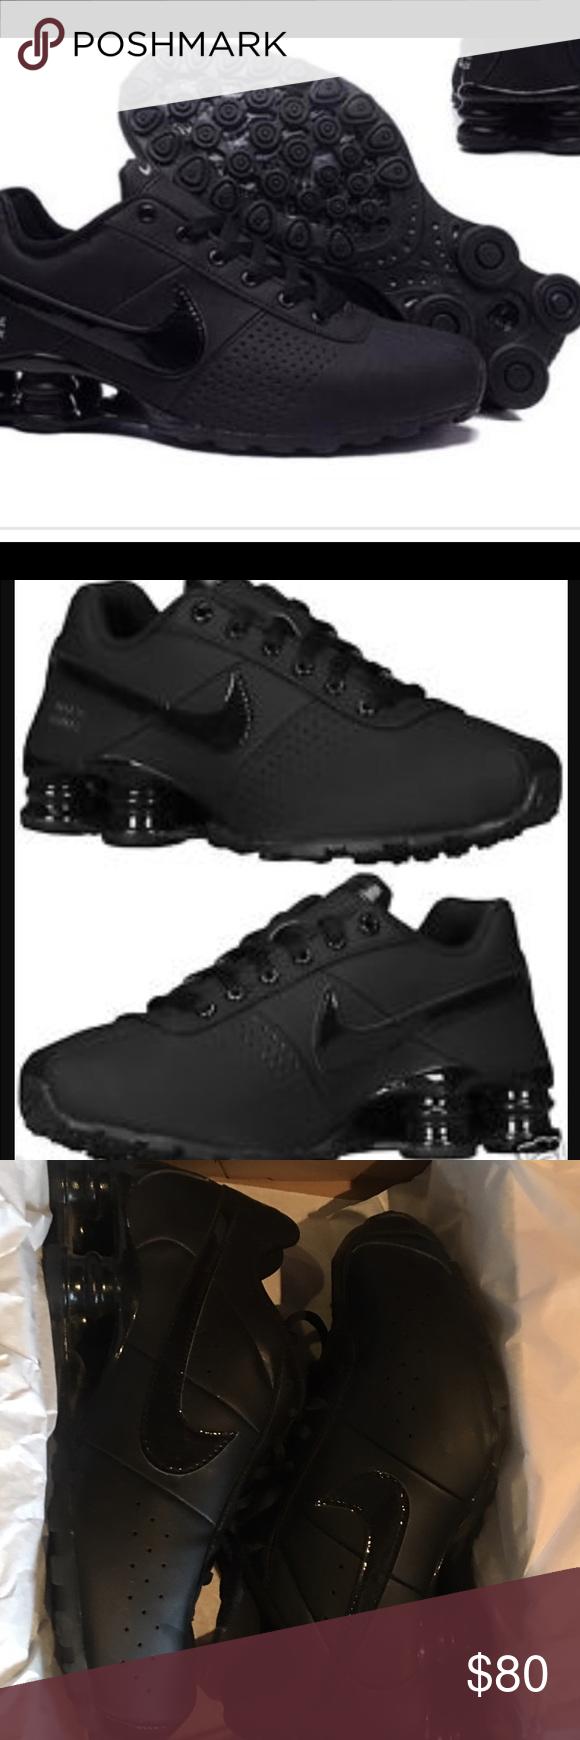 Nike Shox CL Youth Tennis Shoes Brand